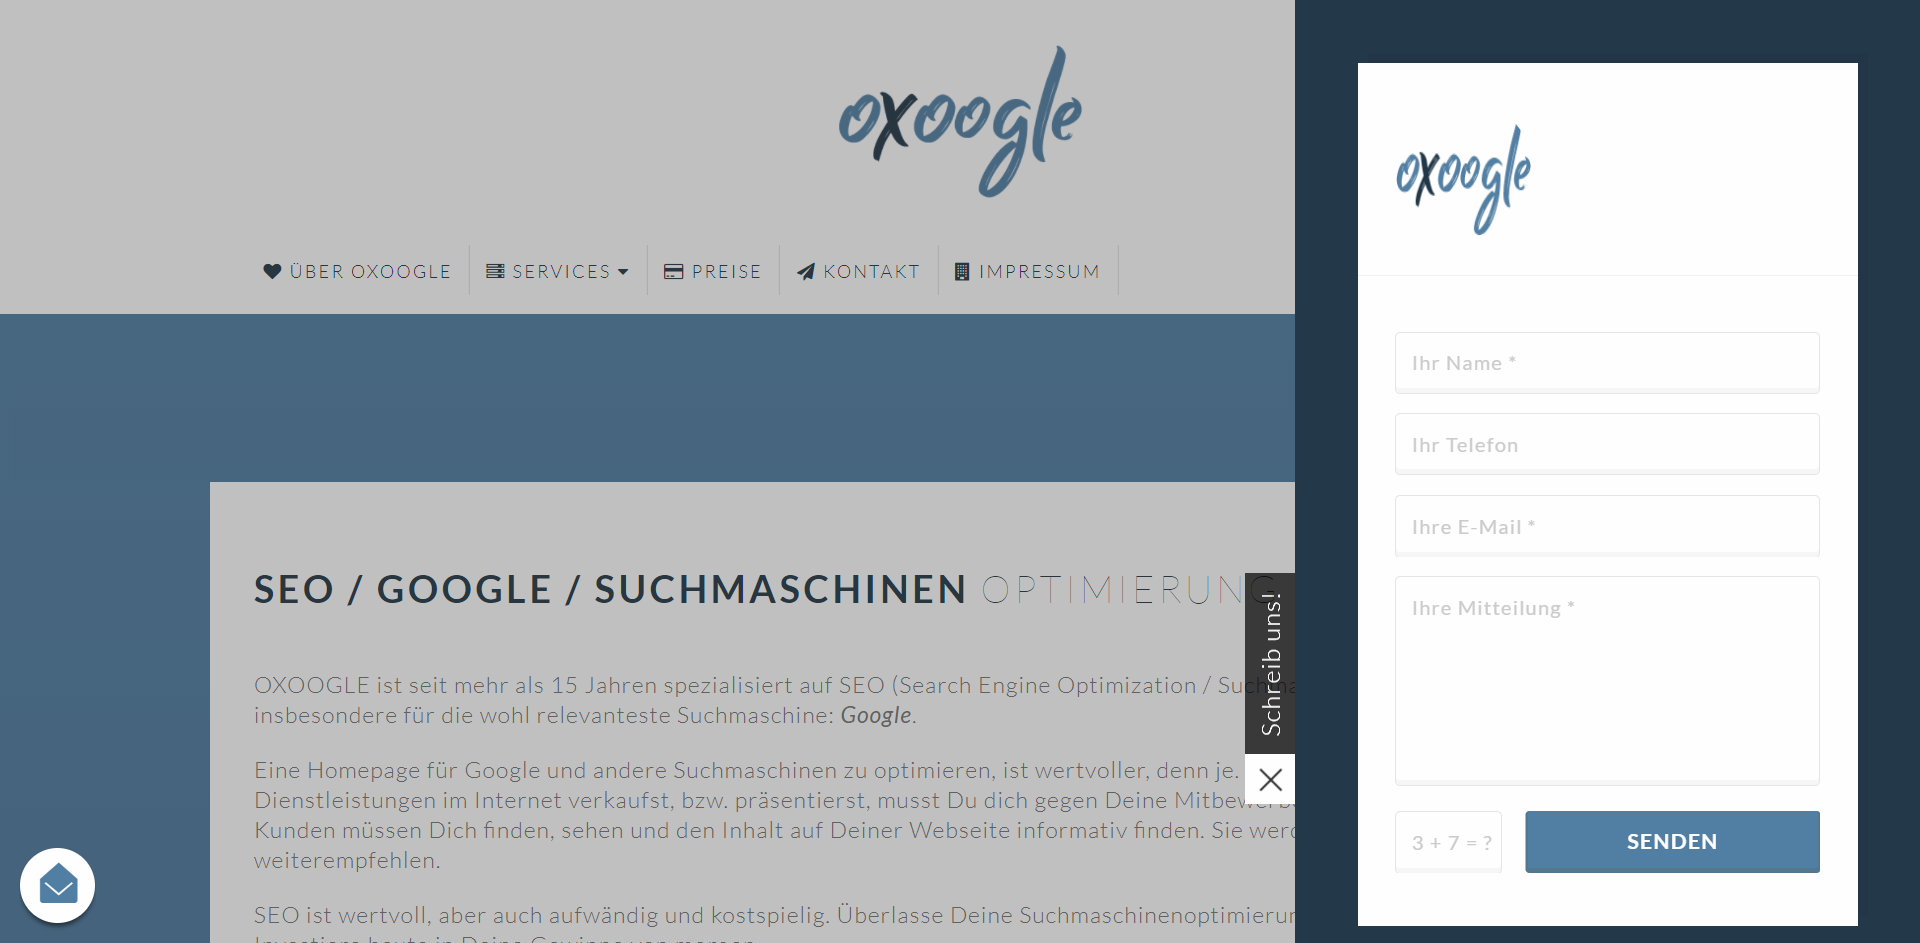 OXOOGLE SEO / Webdesign Referenz